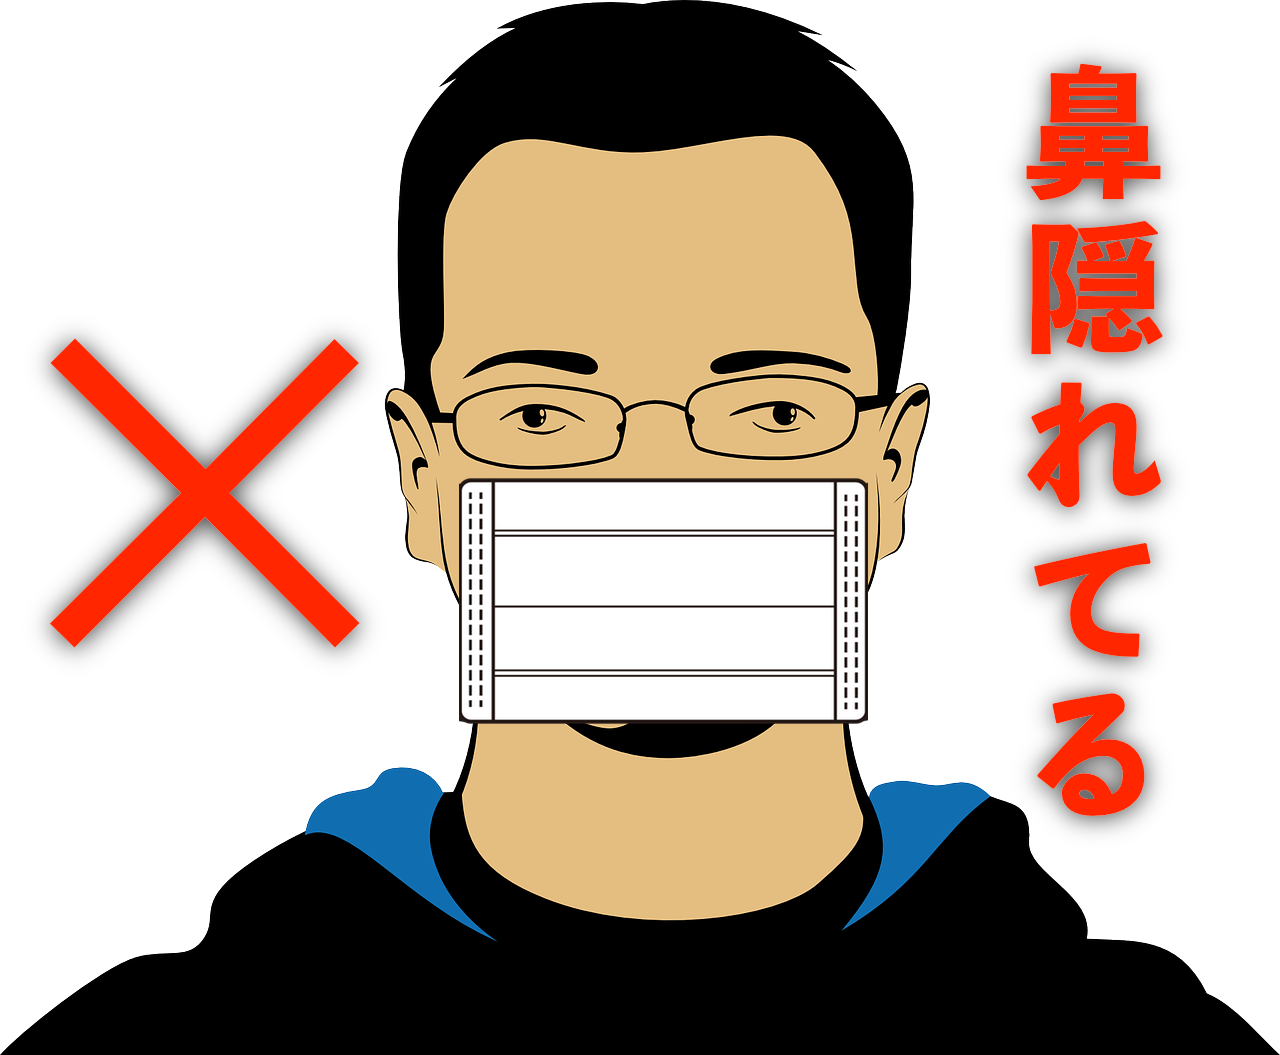 FaceID鼻隠れている認証の画像